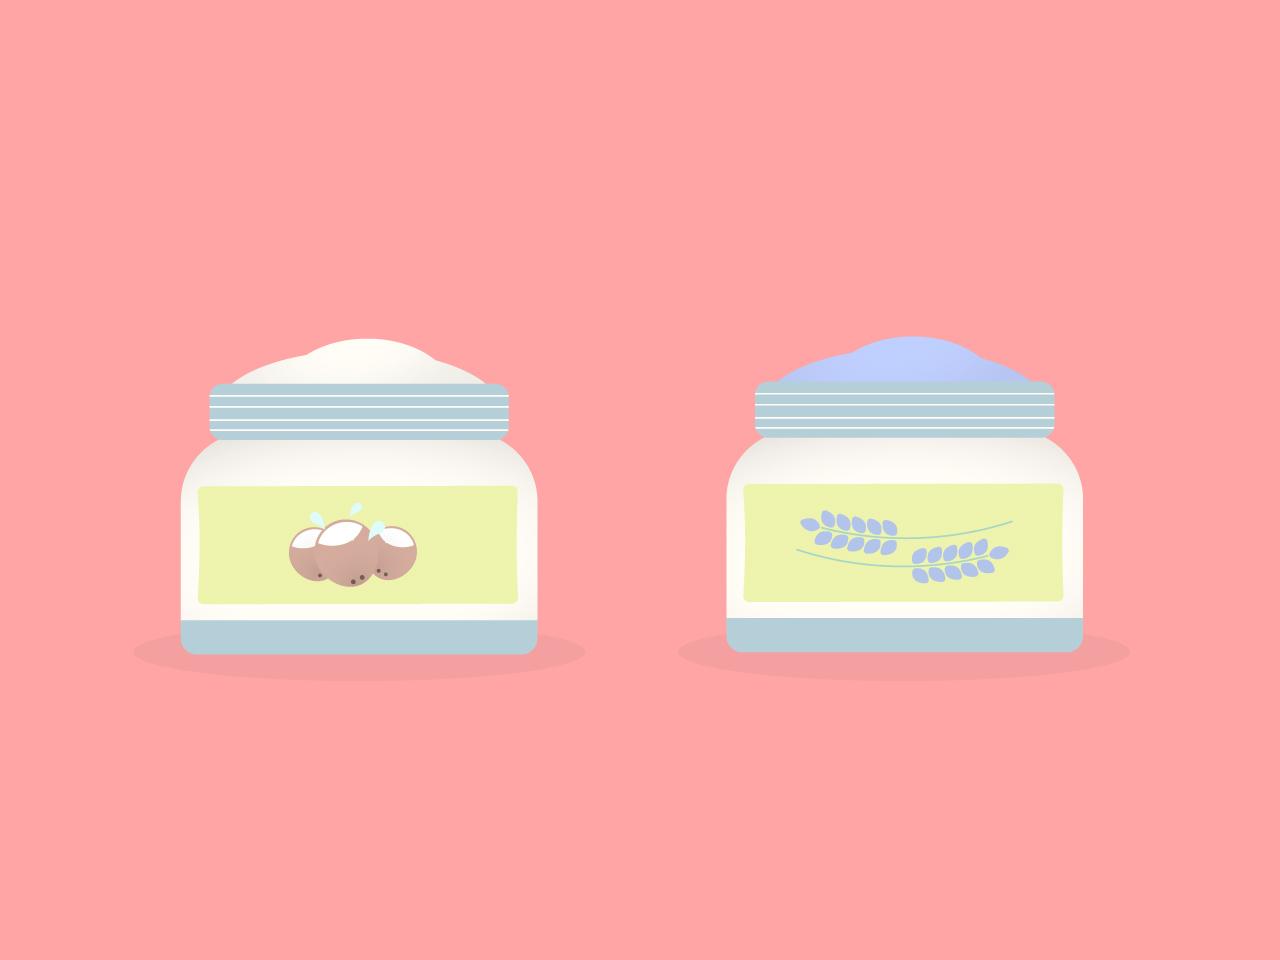 Hand creams (coconut and lavender) flat design lavender coconut cream illustration design